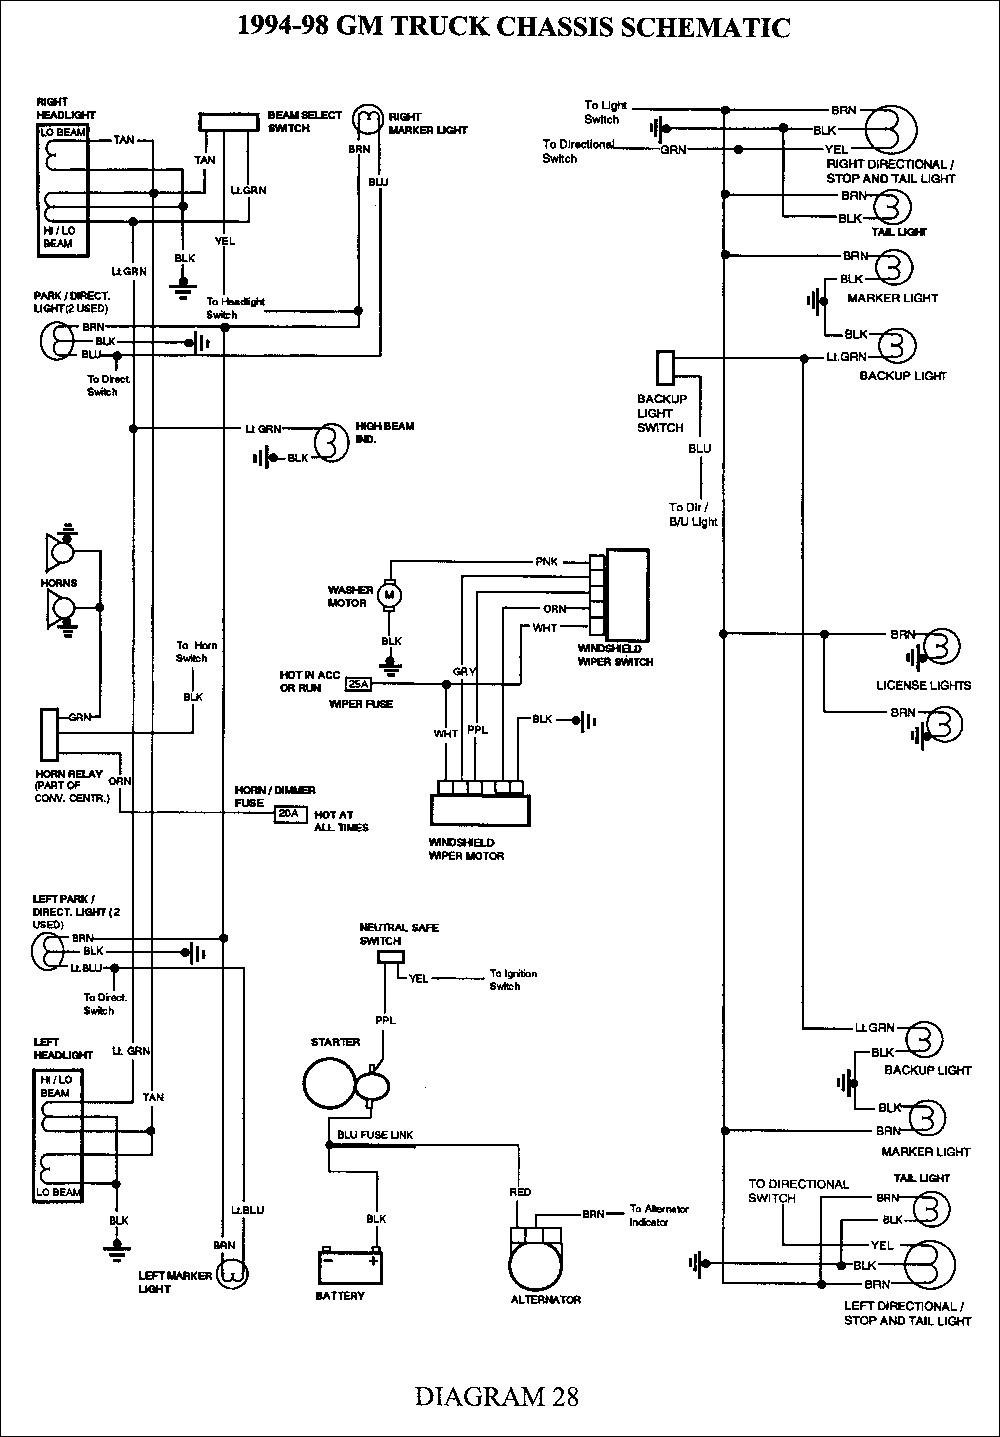 Chevrolet 1500 Trailer Wiring Diagram   Wiring Library